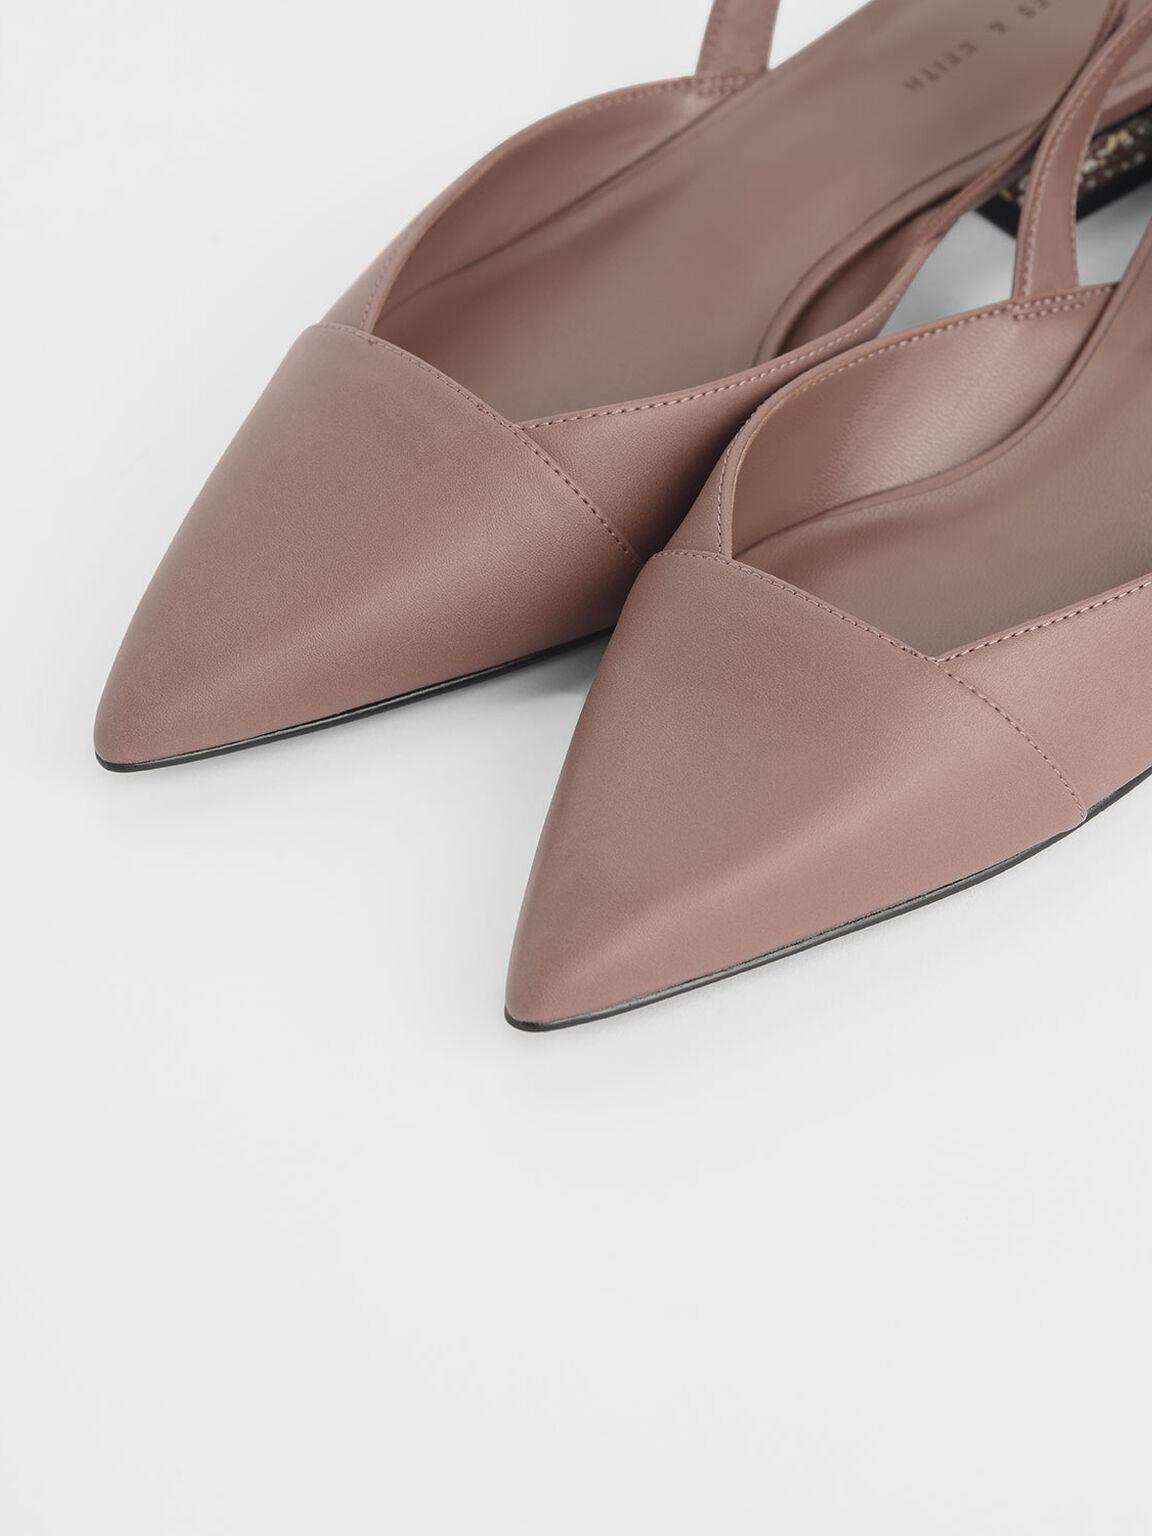 Terrazzo Print Sculptural Heel Covered Sandals, Pink, hi-res